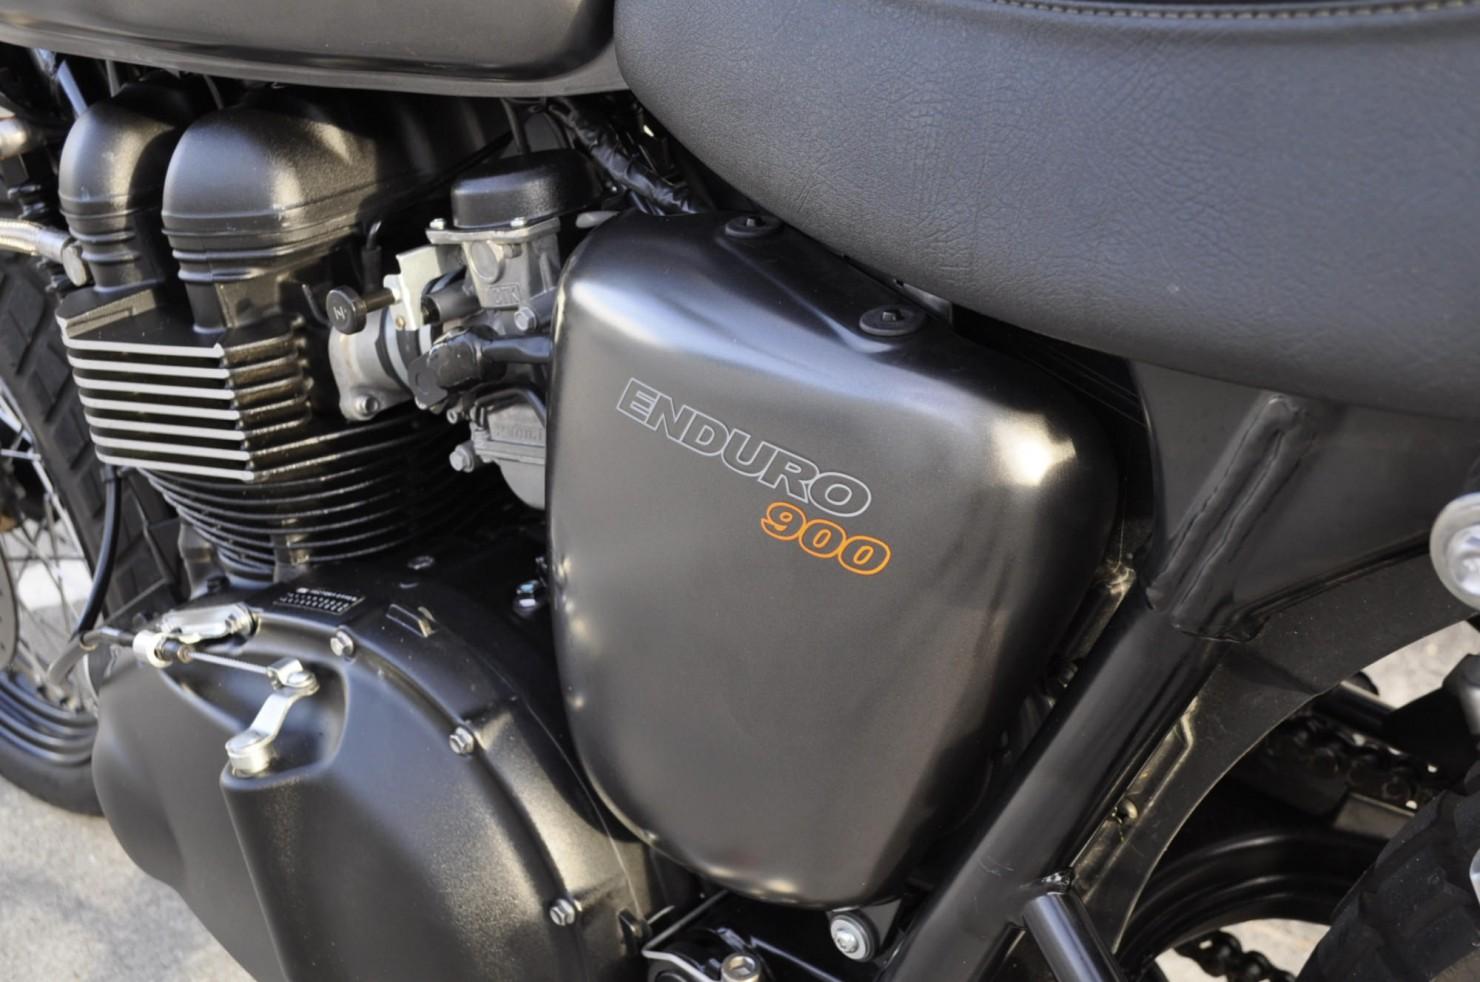 triumph_enduro_motorcycle_15